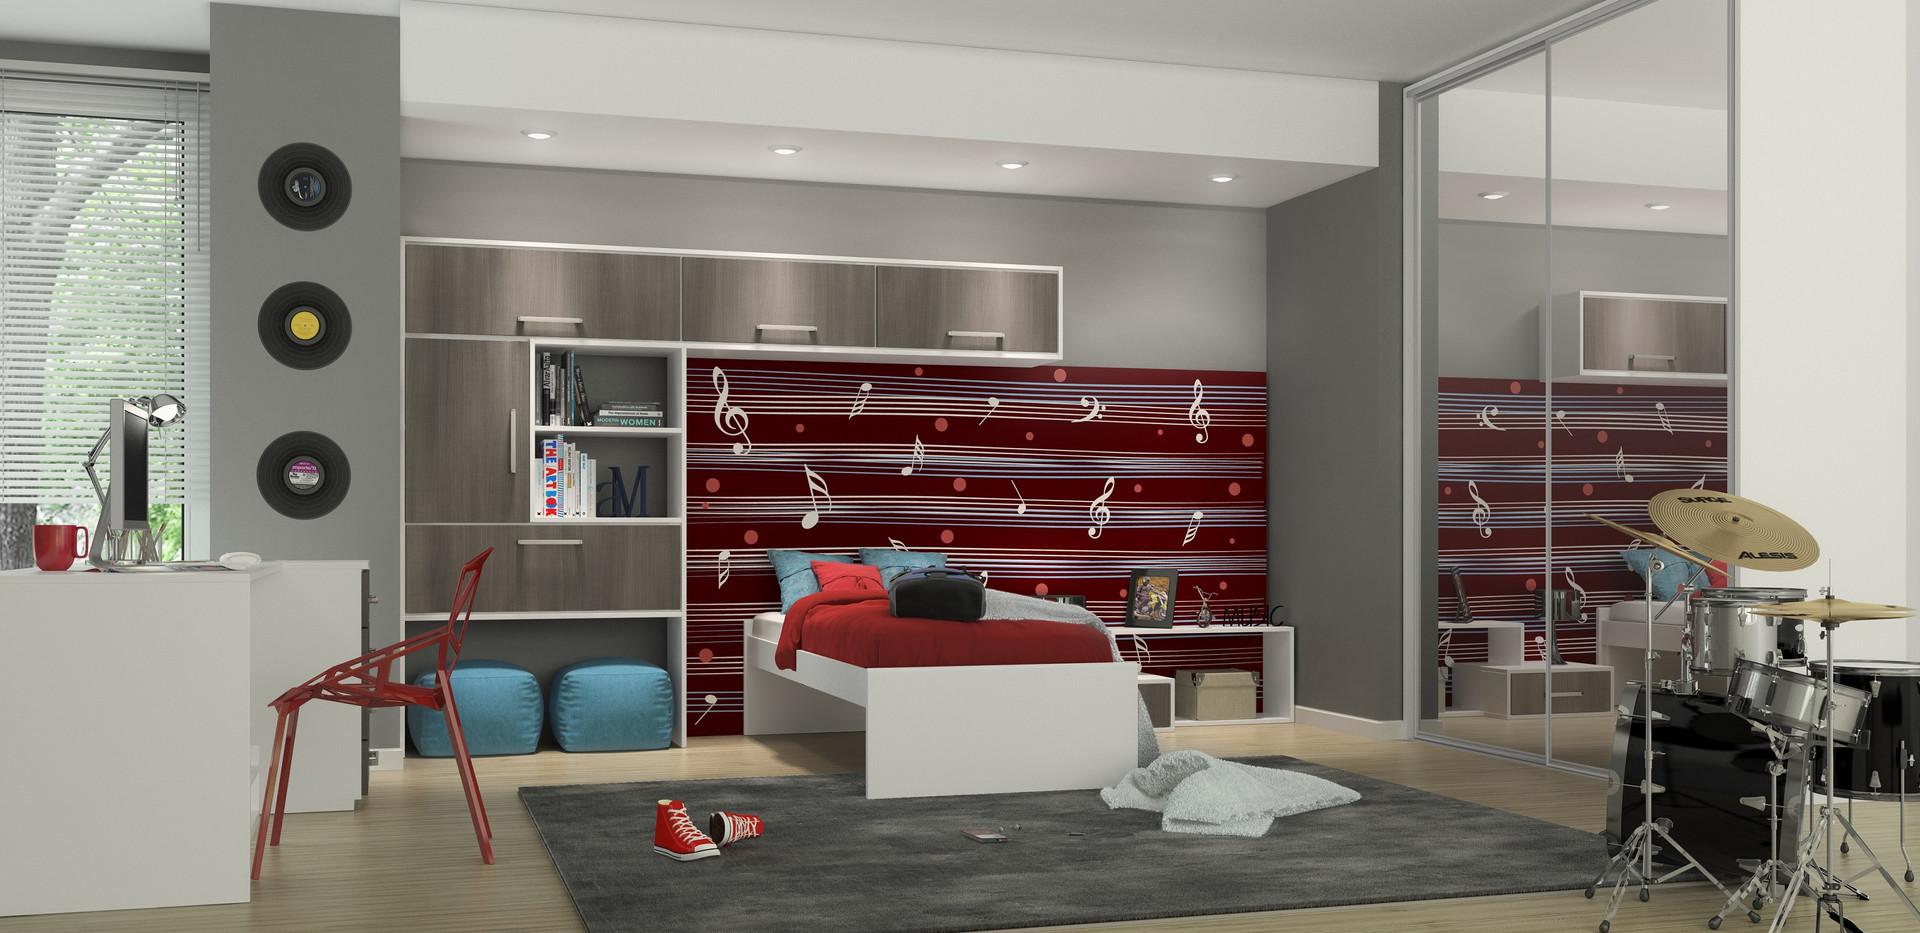 DOR13_dormitorio_quarto_guarda_roupa_men